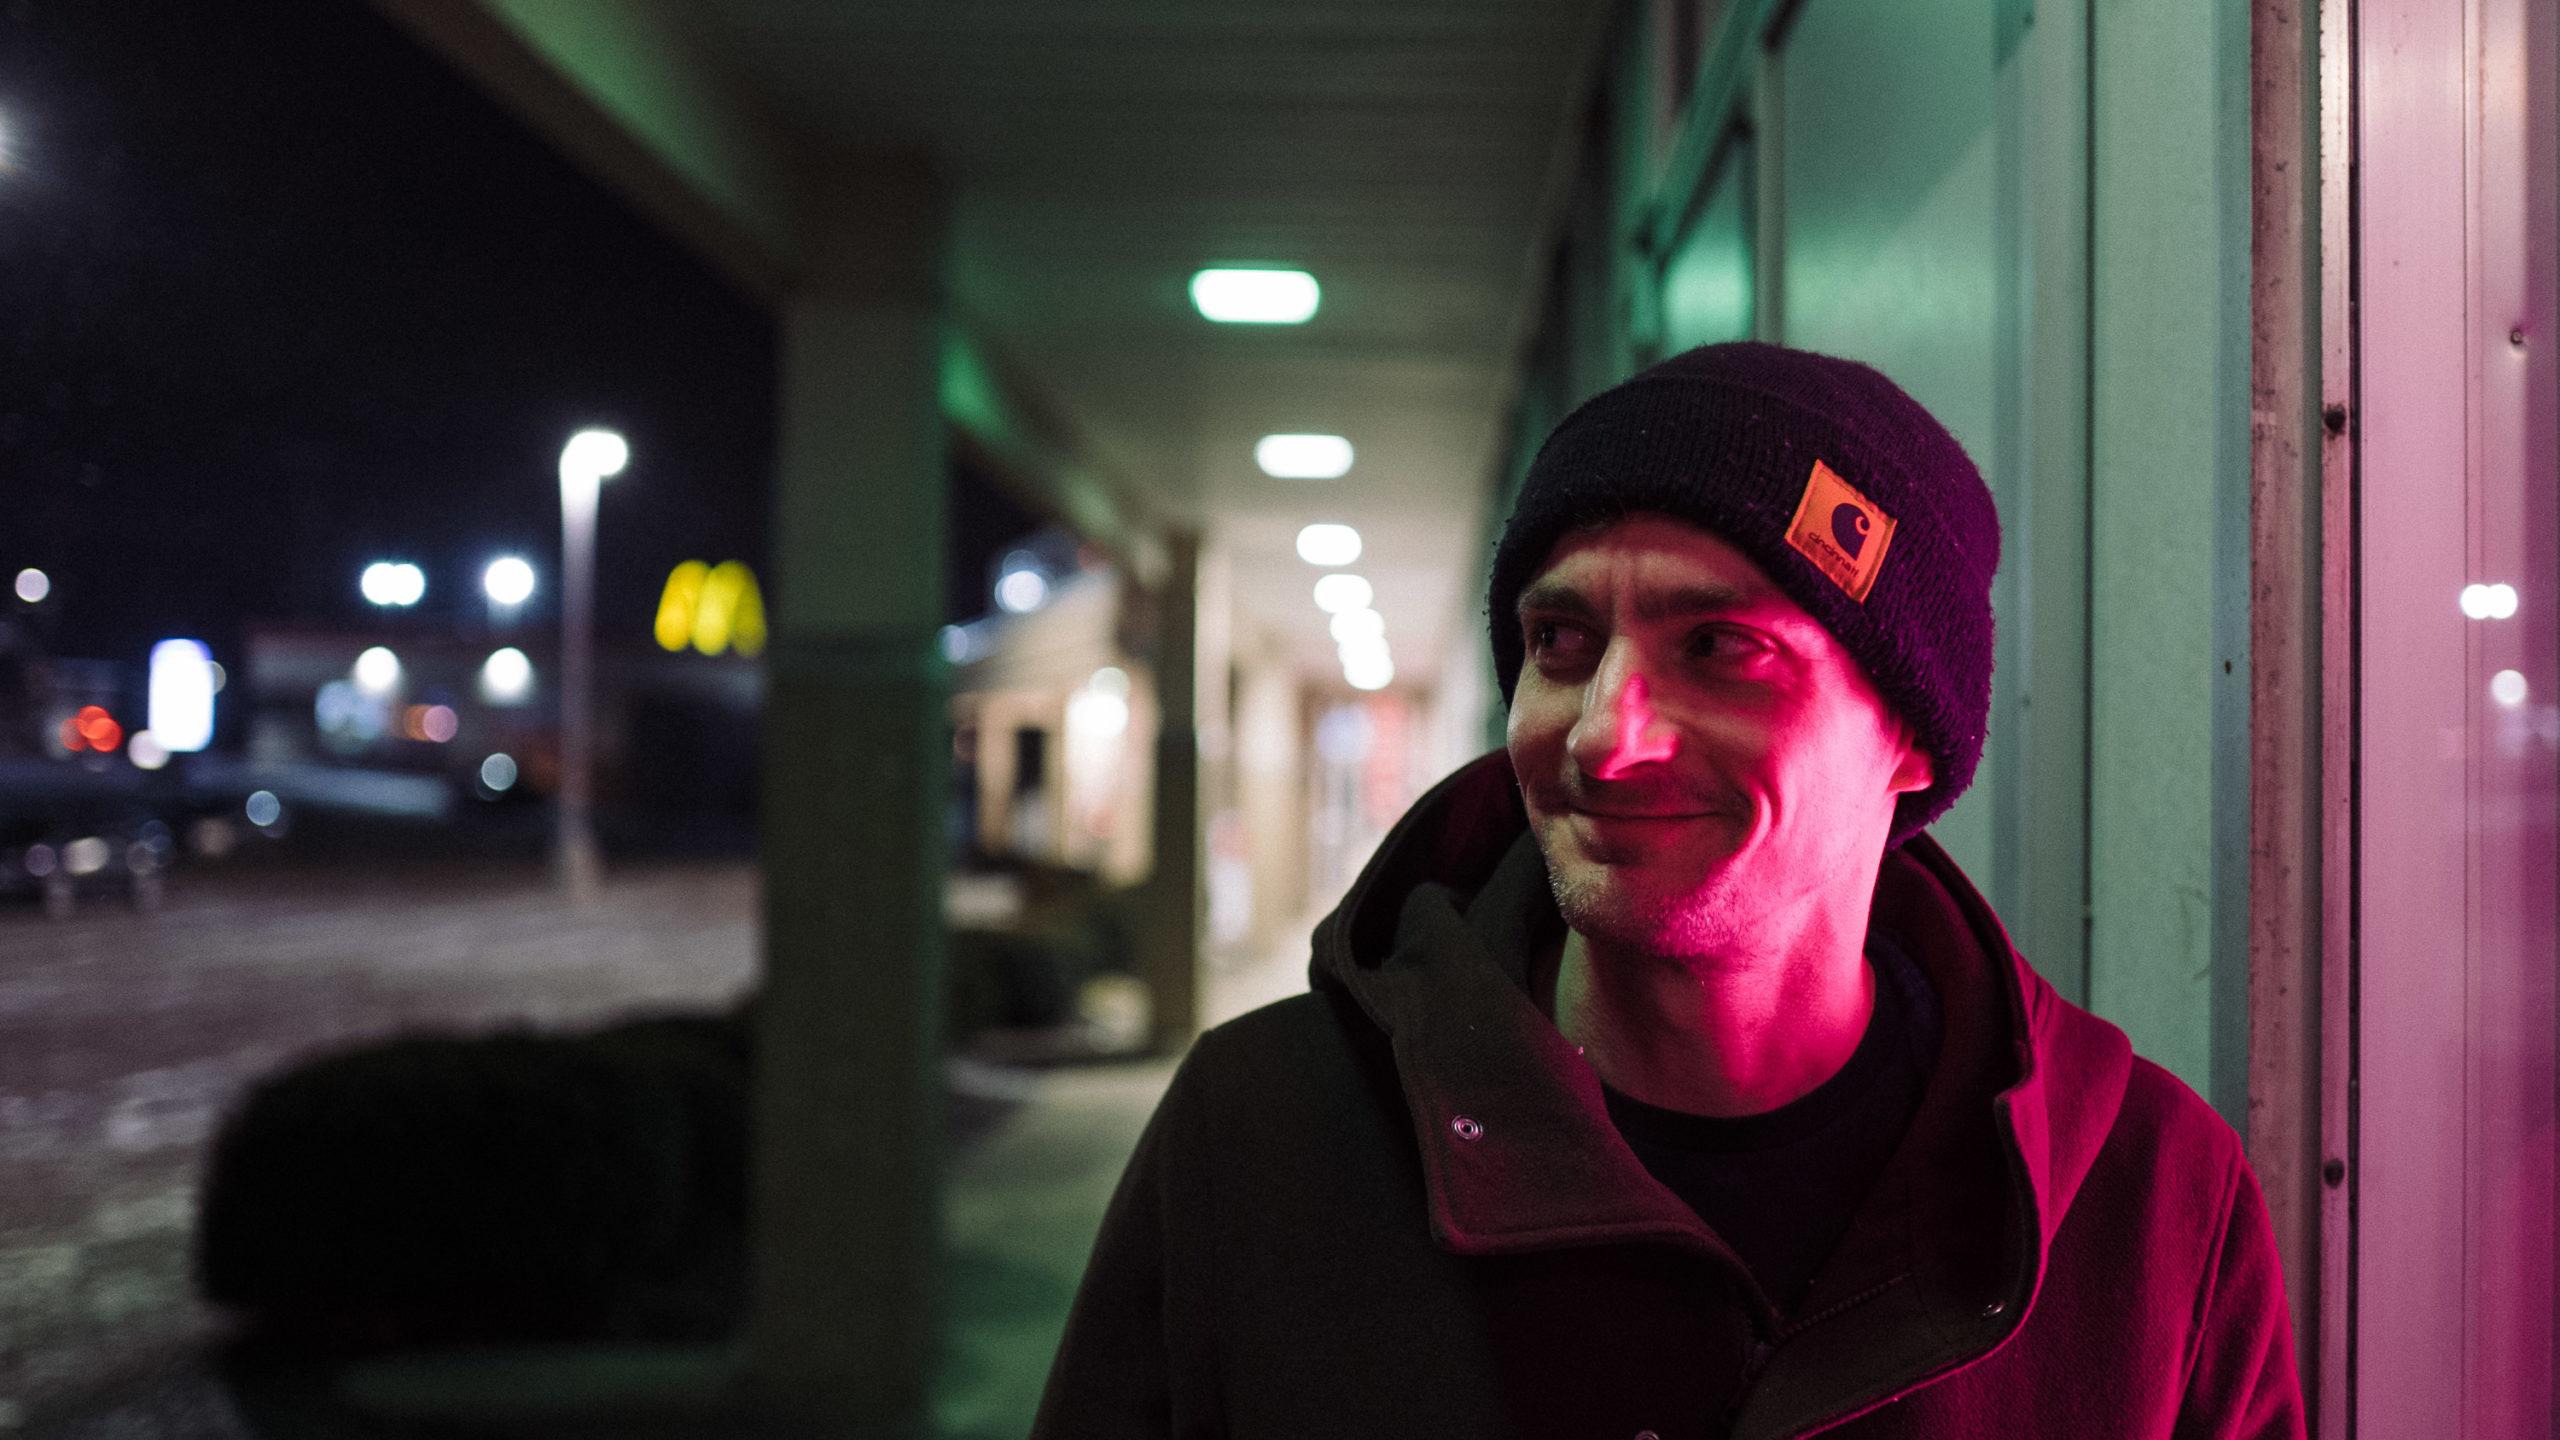 man lit by neon light